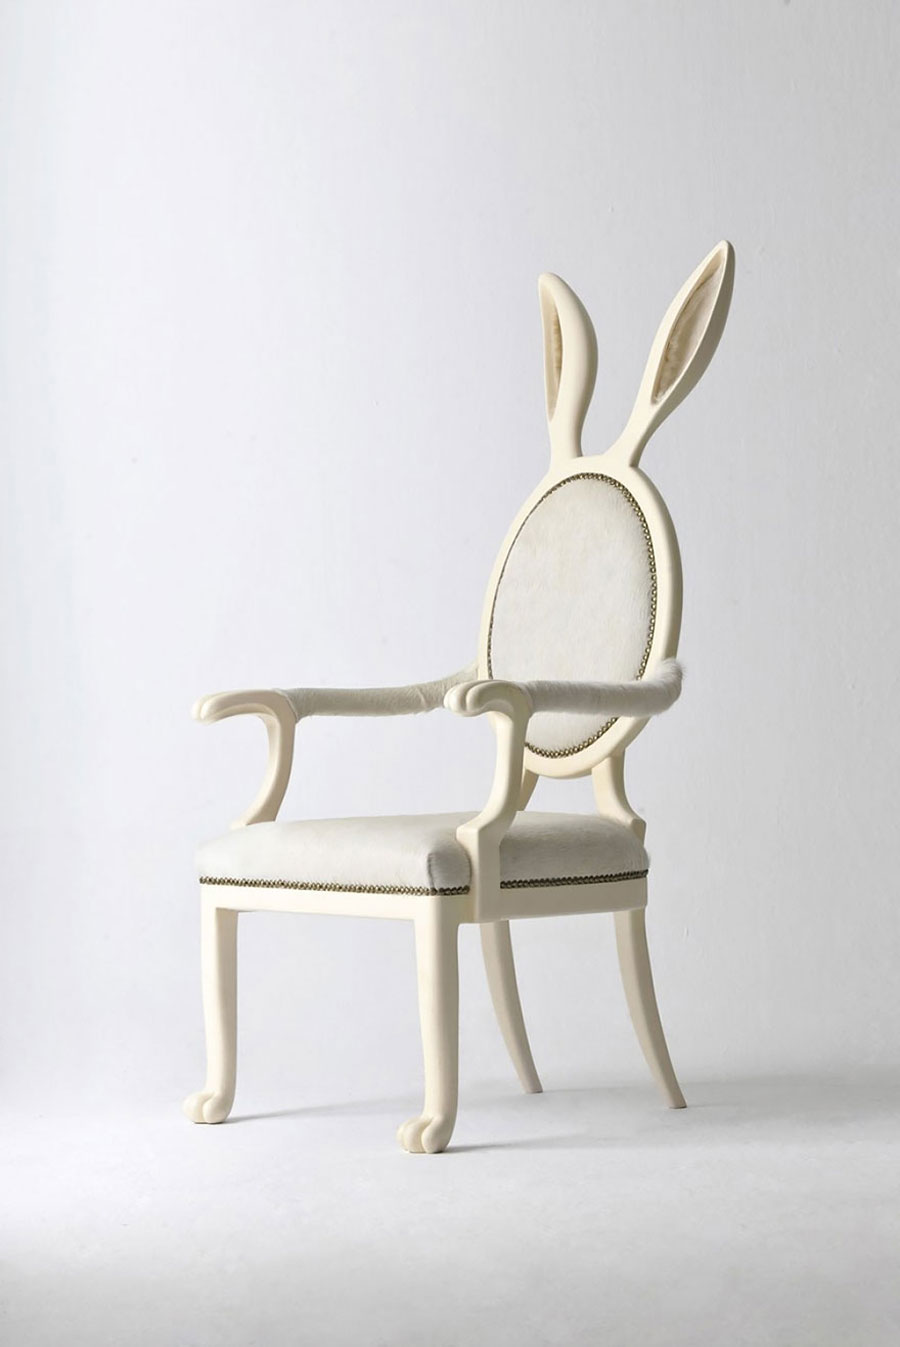 9 strange but visually impressive chair designs